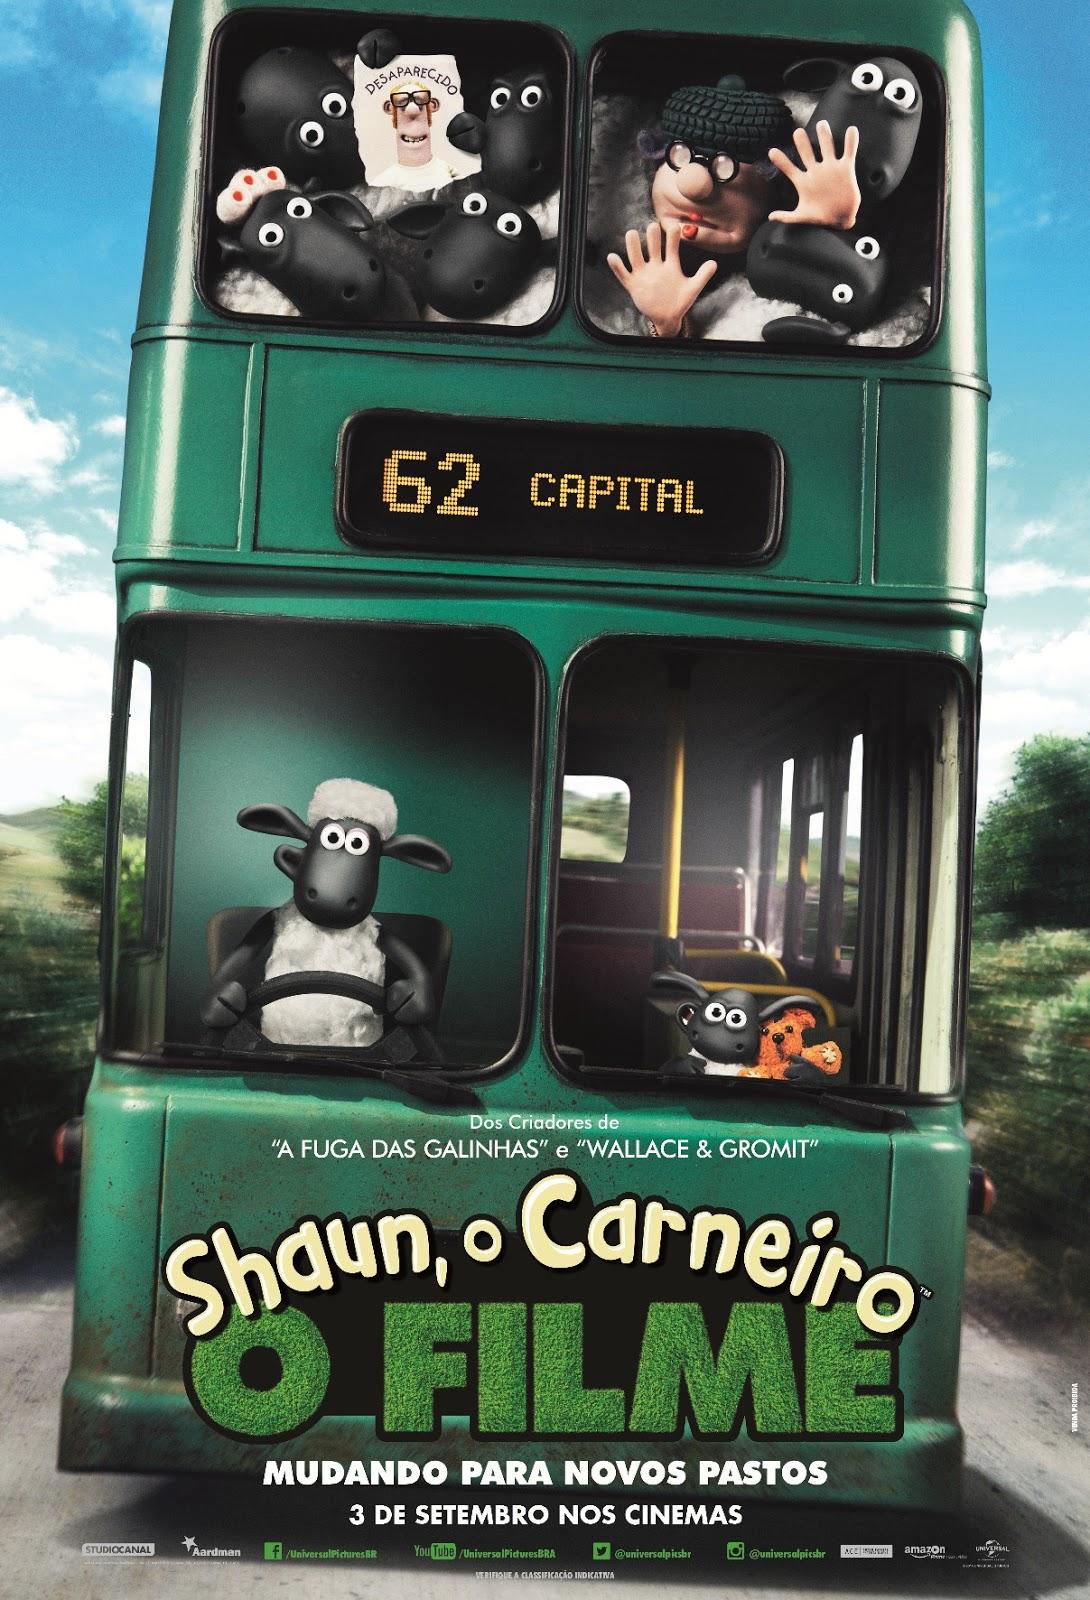 Shaun: O Carneiro – Filme - HD 720p